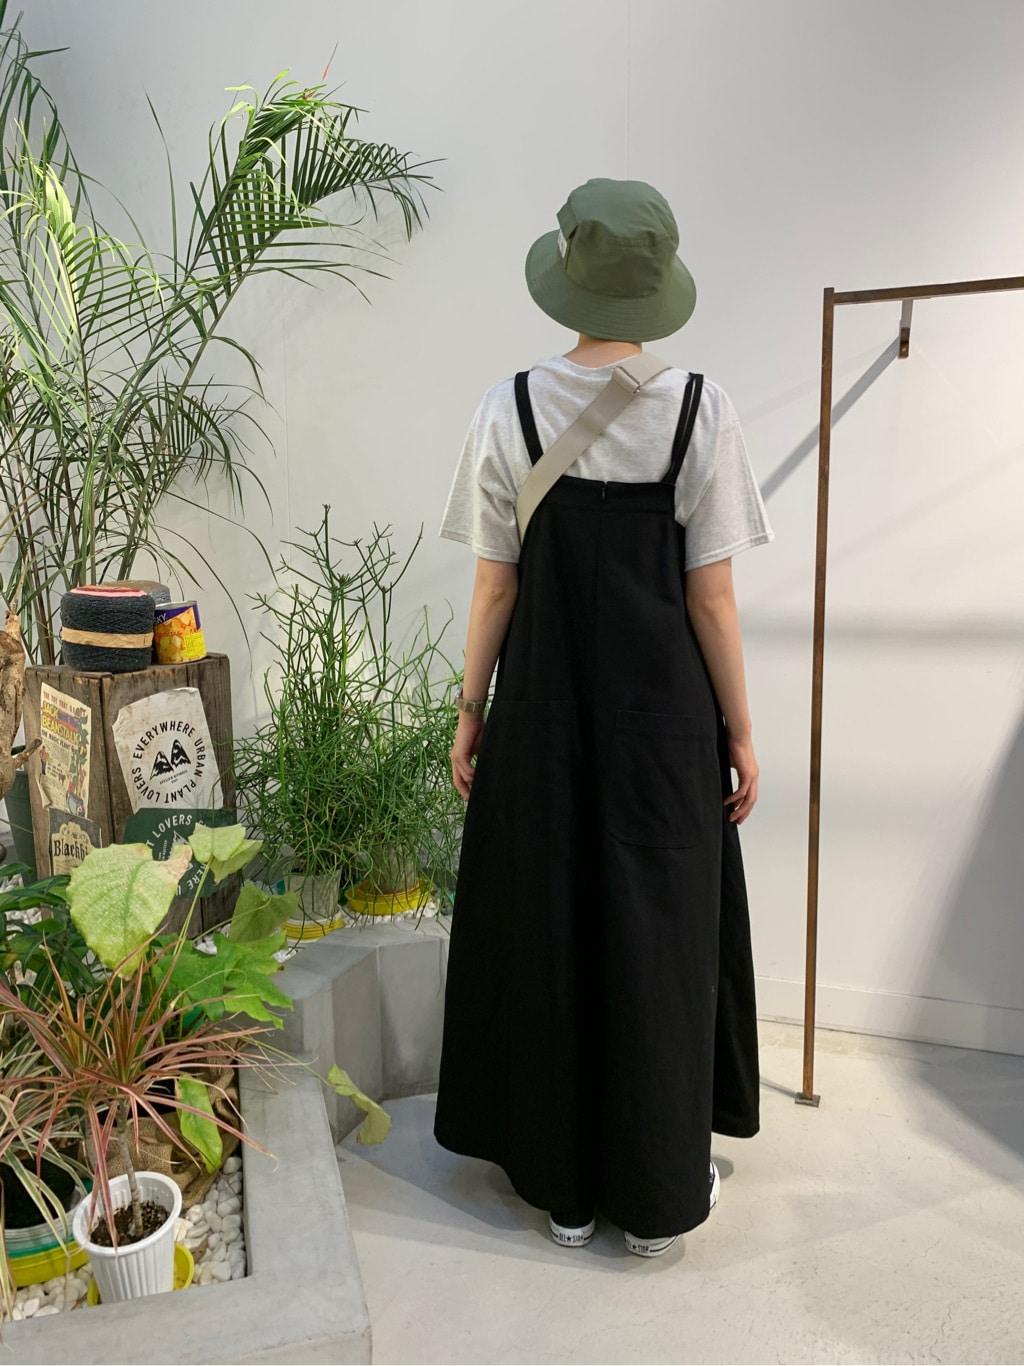 l'atelier du savon 名古屋栄路面 身長:161cm 2020.07.10